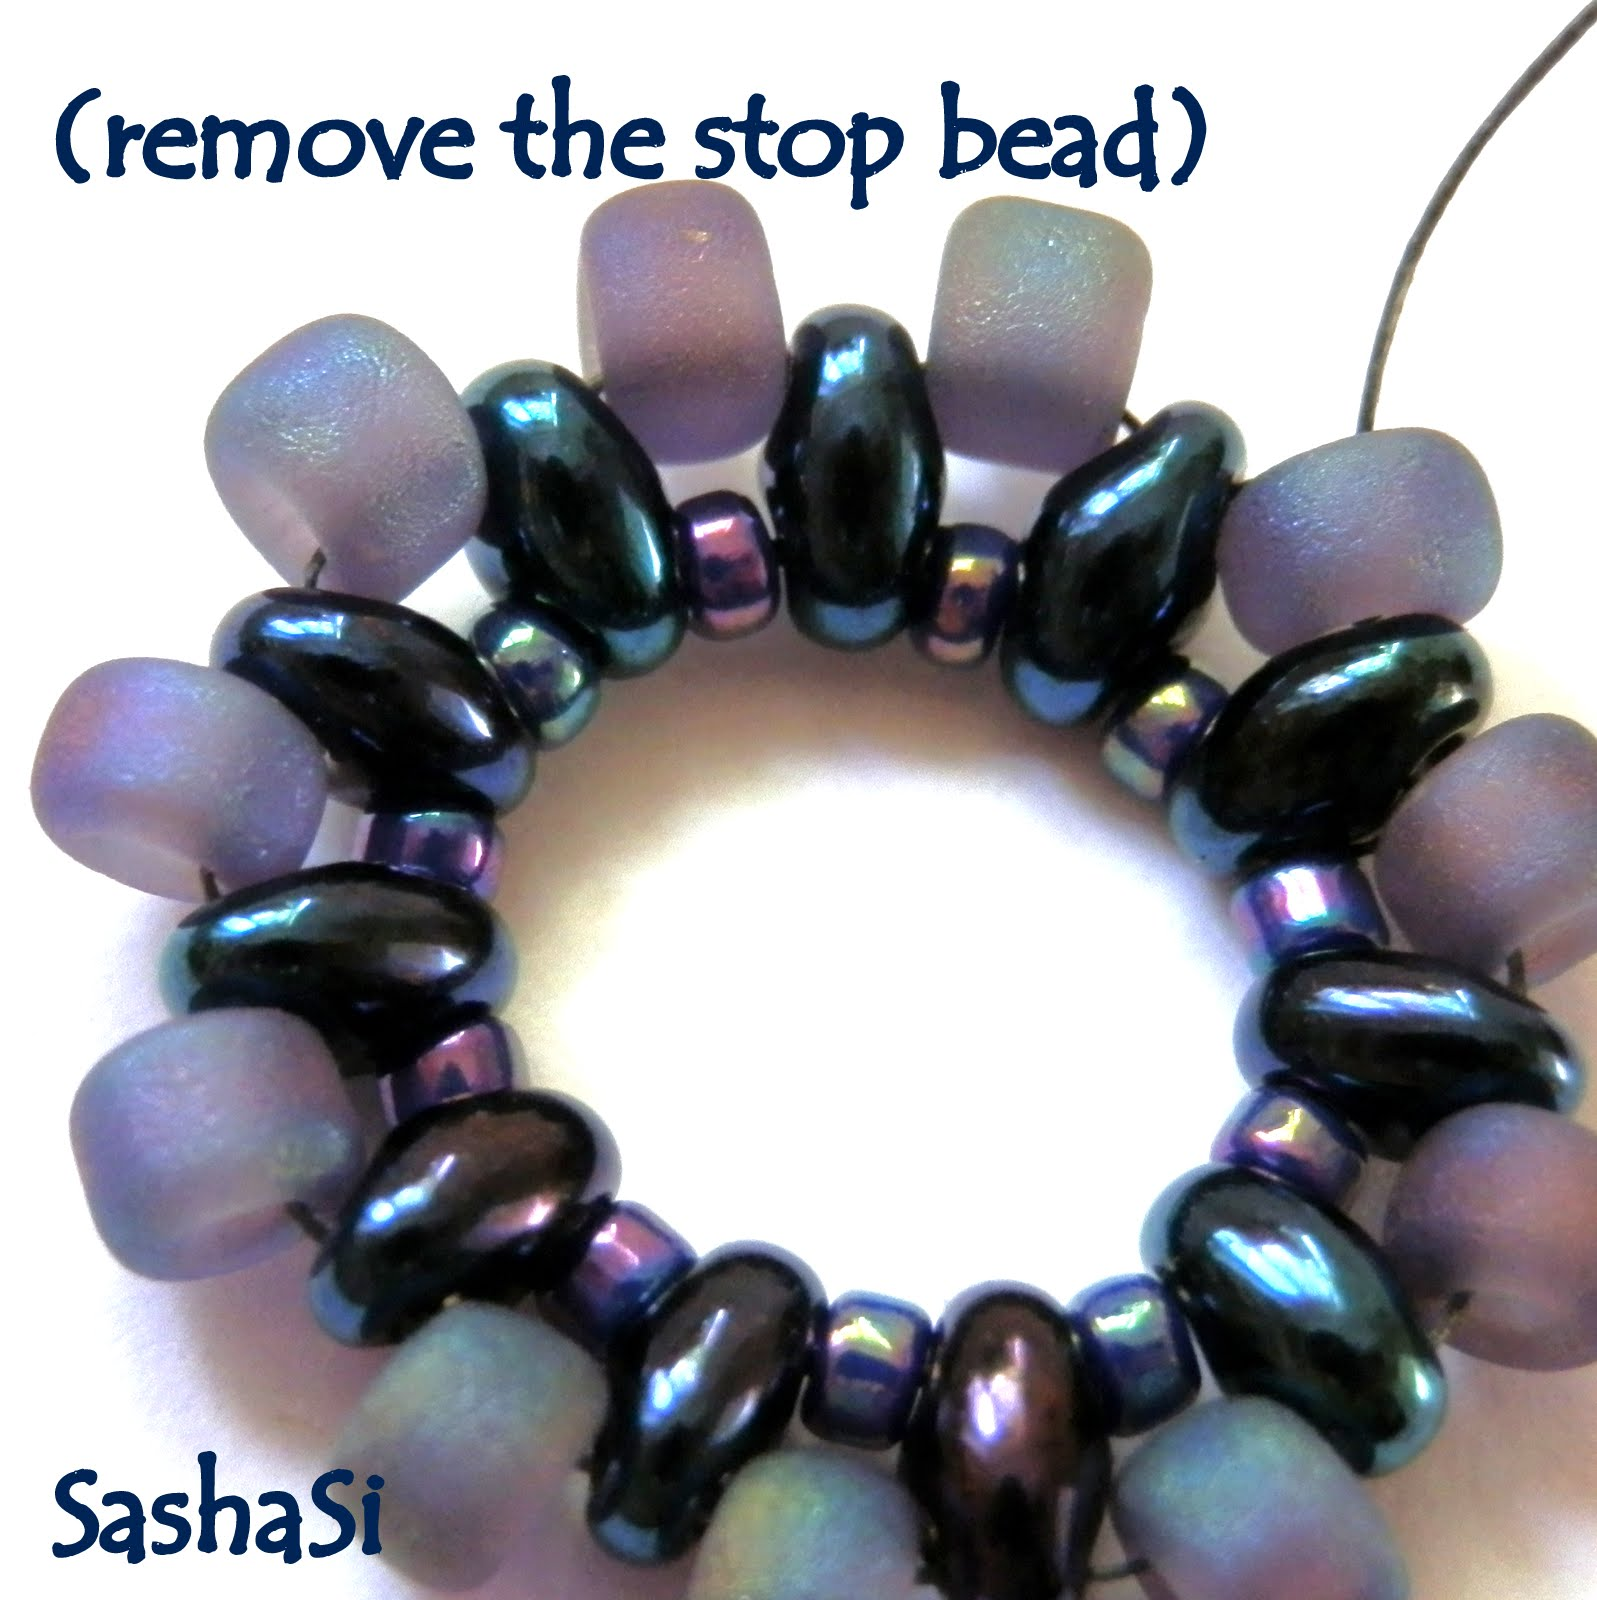 Amazing beaded pendant tutorial photos jewelry collection ideas preciosa twin rivoli pendant tutorial free for personal use baditri Image collections